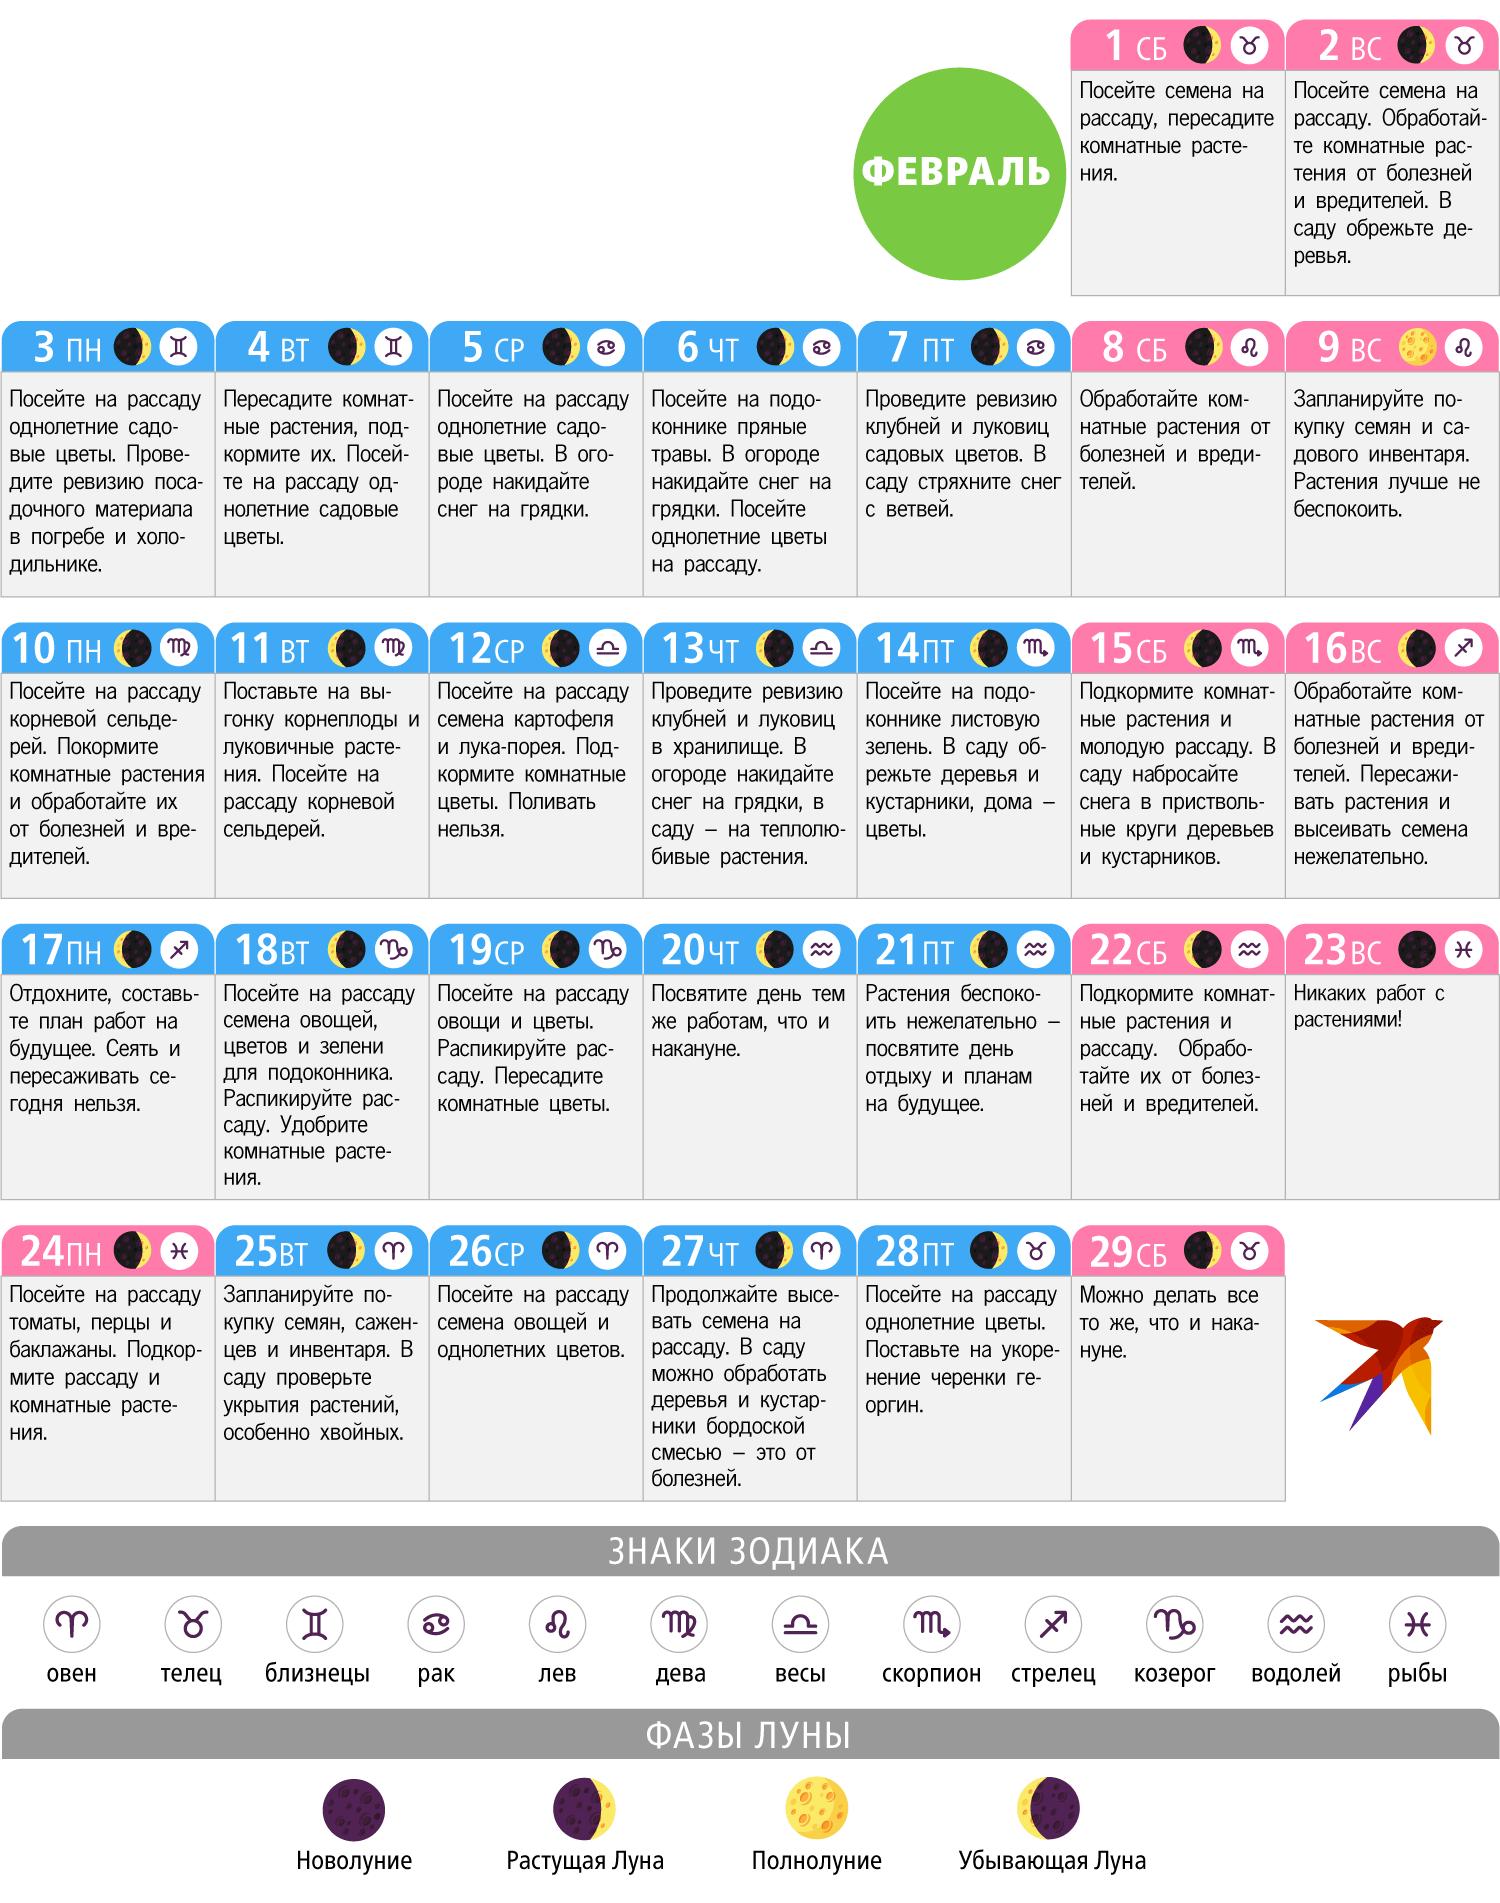 Лунный календарь огородника на май 2020